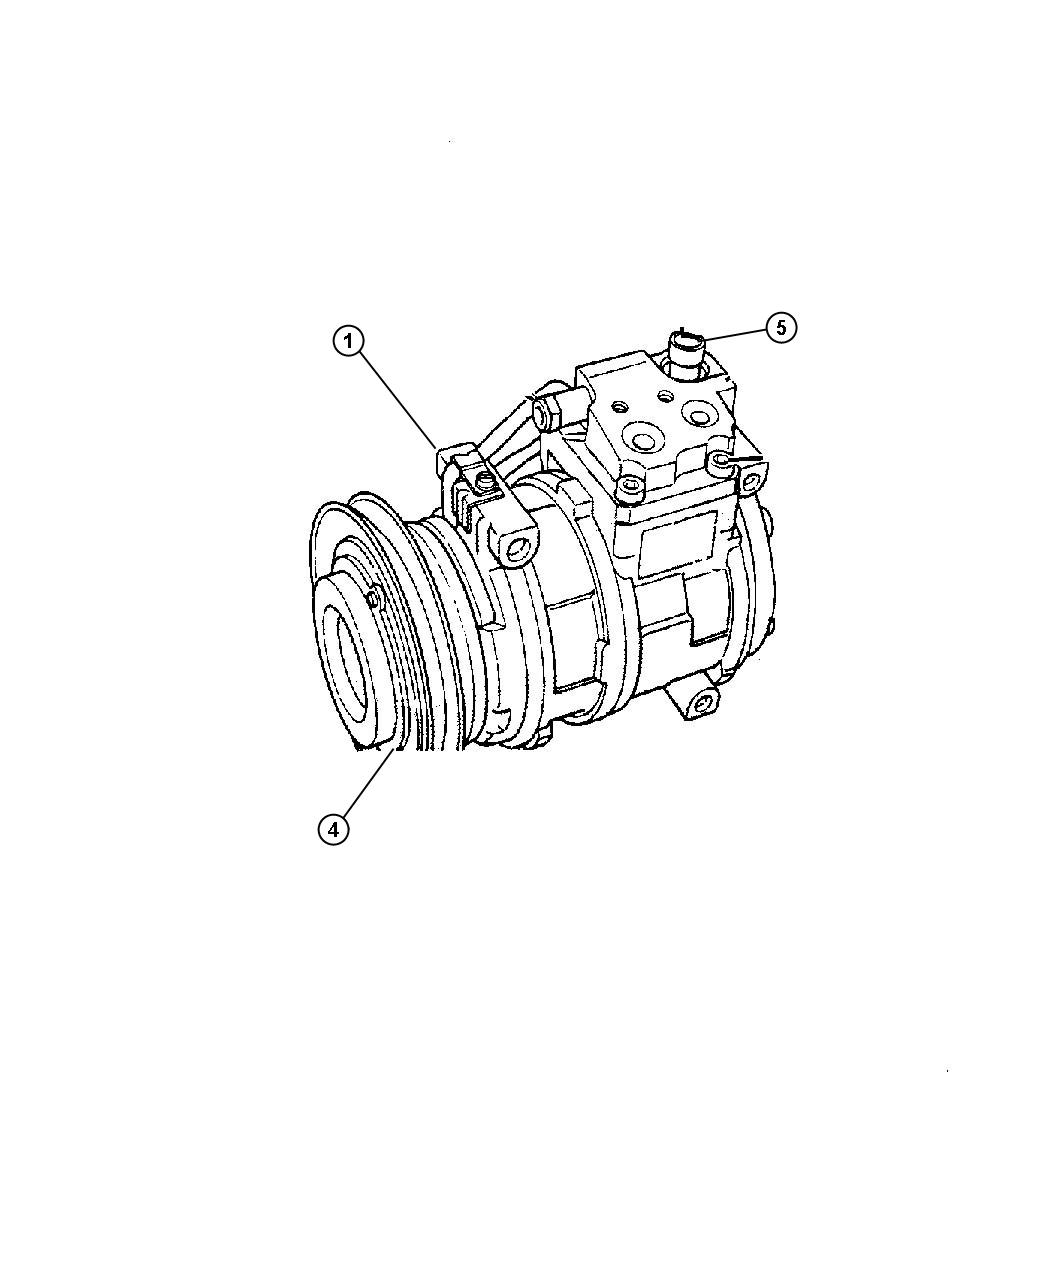 2002 Dodge Clutch overhaul kit. A/c compressor. Automatic